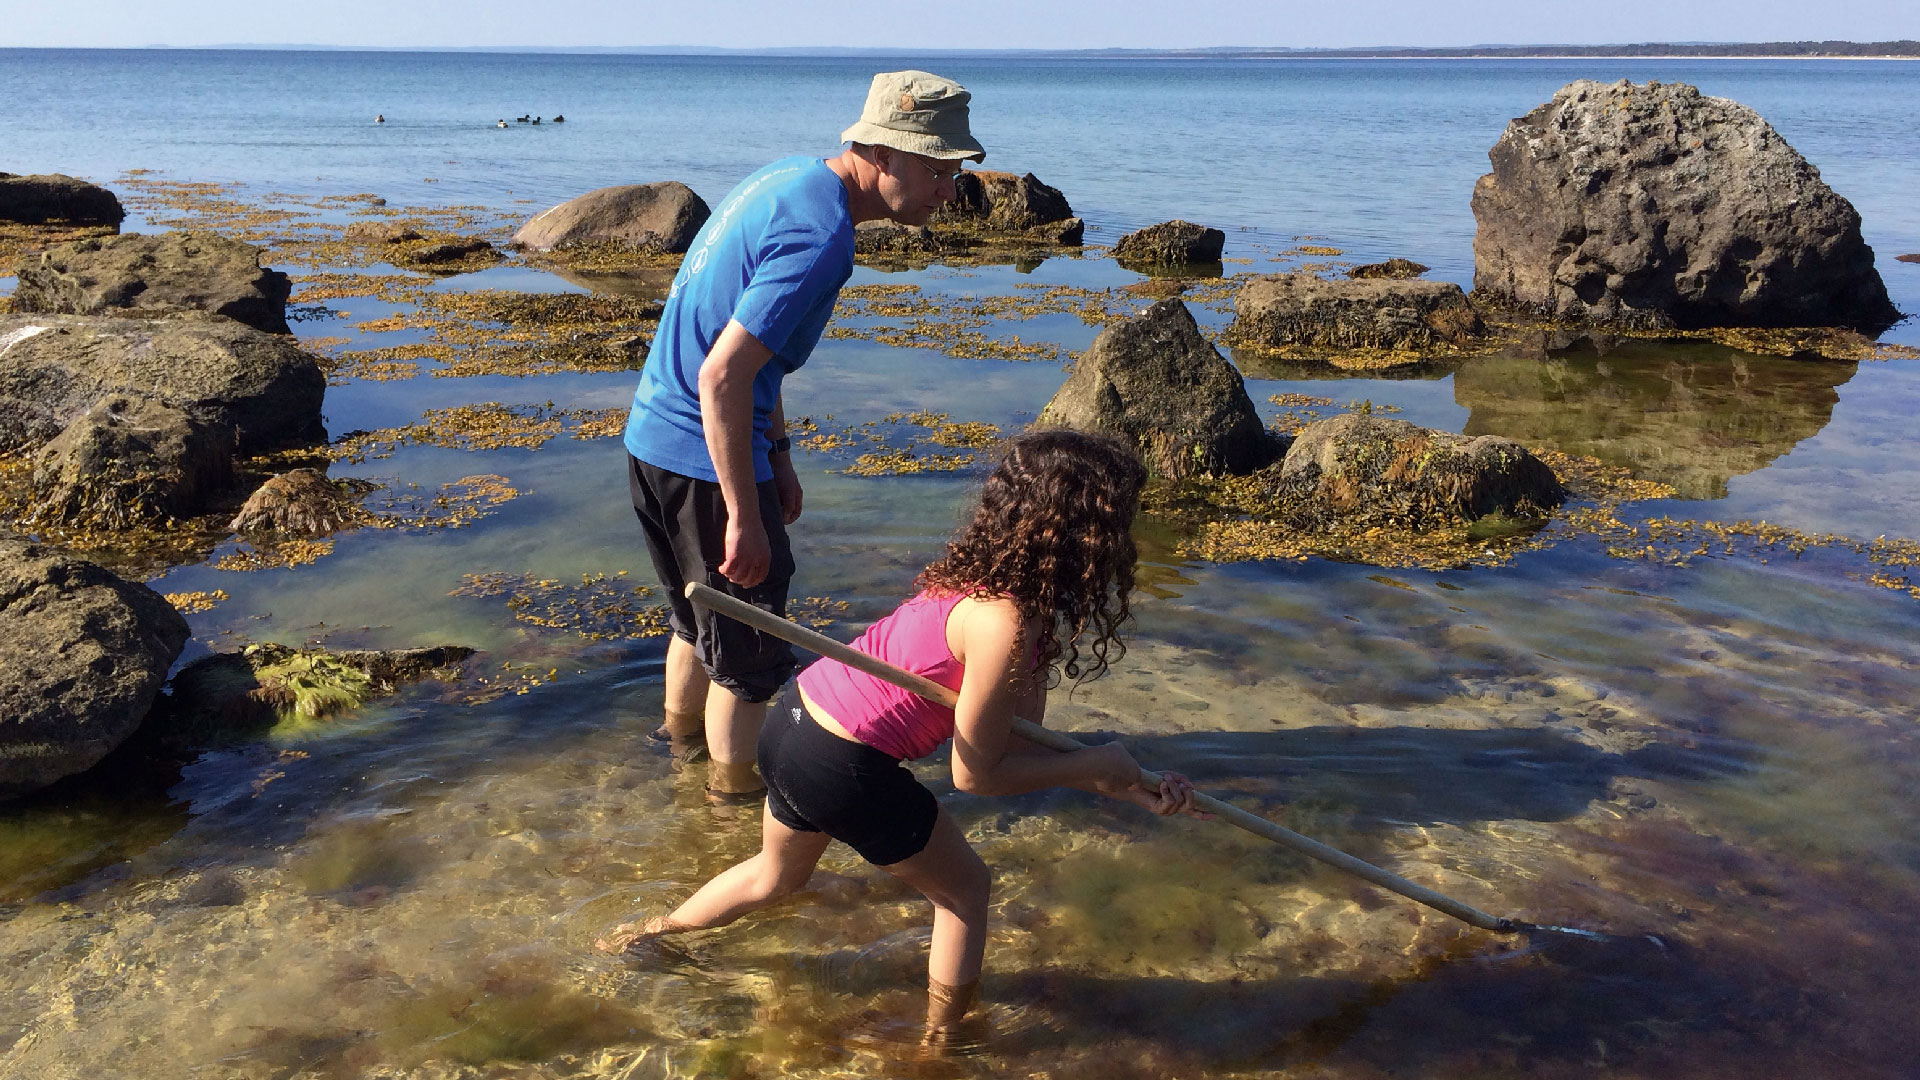 Håva bland sandrkor och sågtång i havet. Foto Karin Magntorn